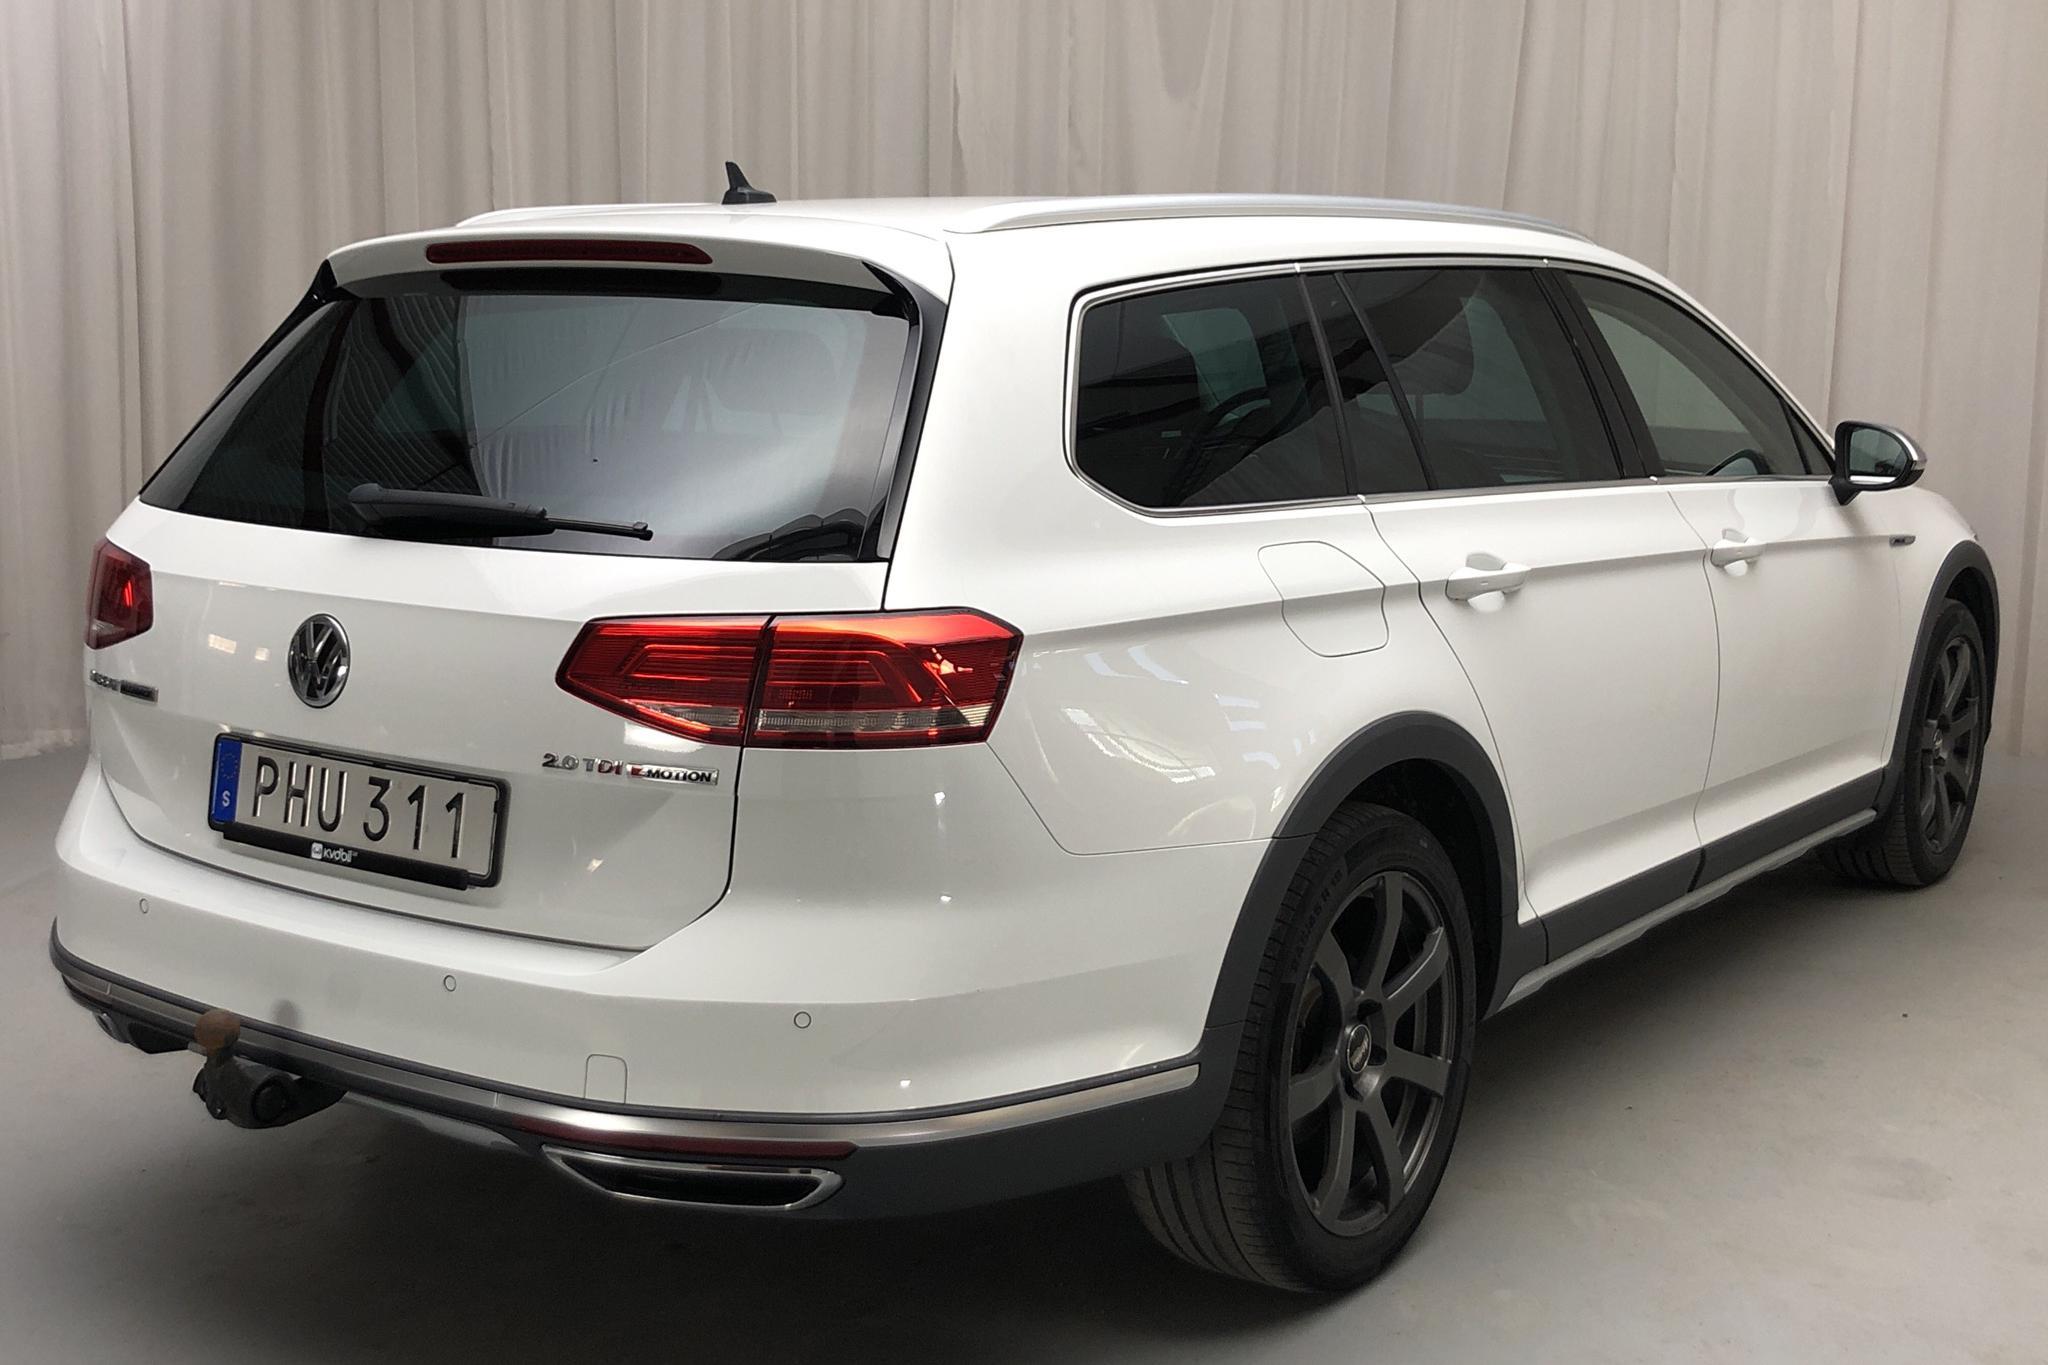 VW Passat Alltrack 2.0 TDI Sportscombi 4MOTION (190hk) - 79 740 km - Automatic - white - 2017